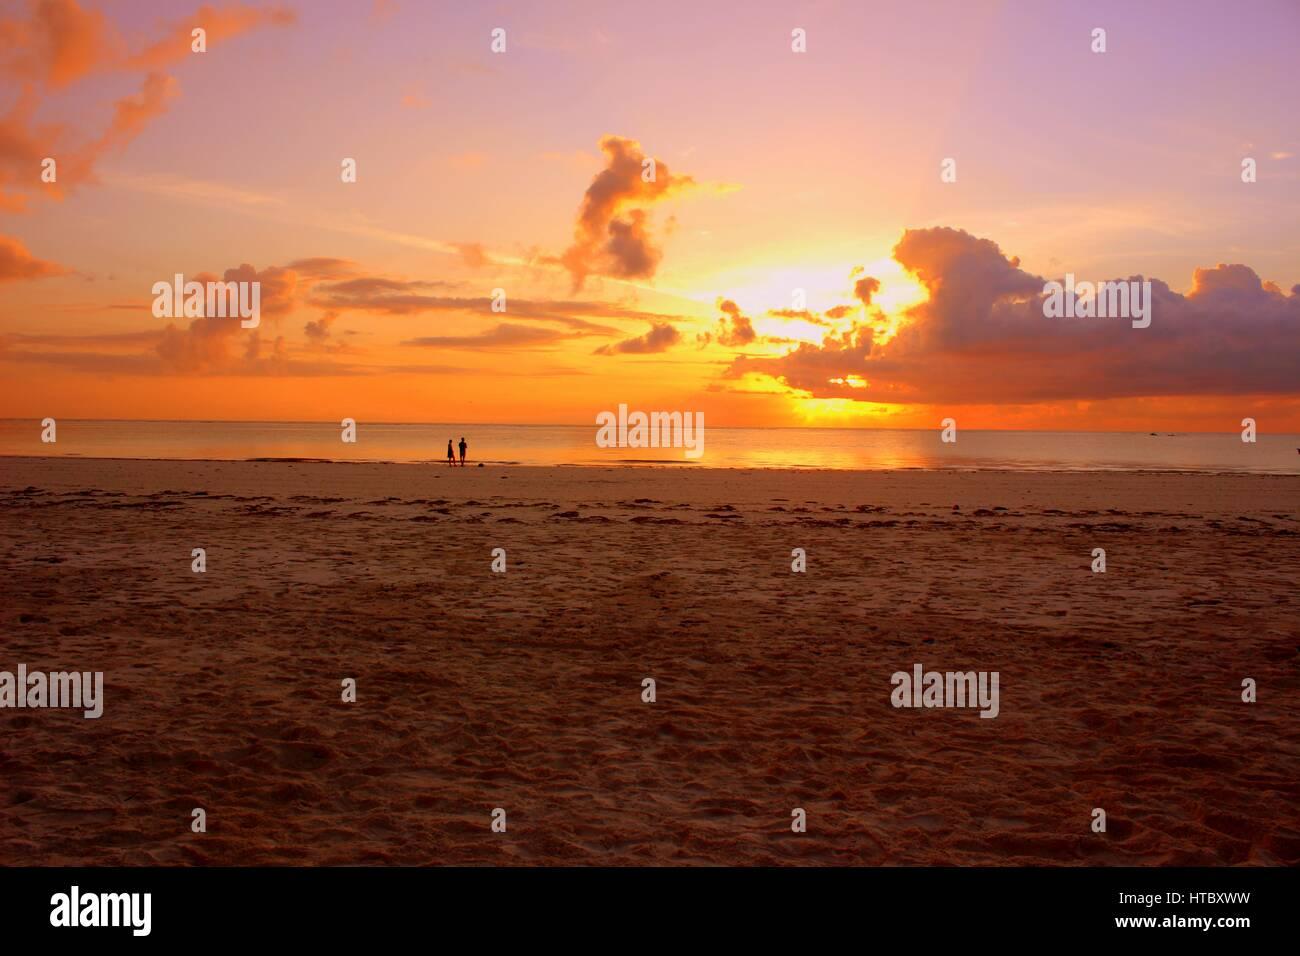 Sunrise at Diani beach - Stock Image